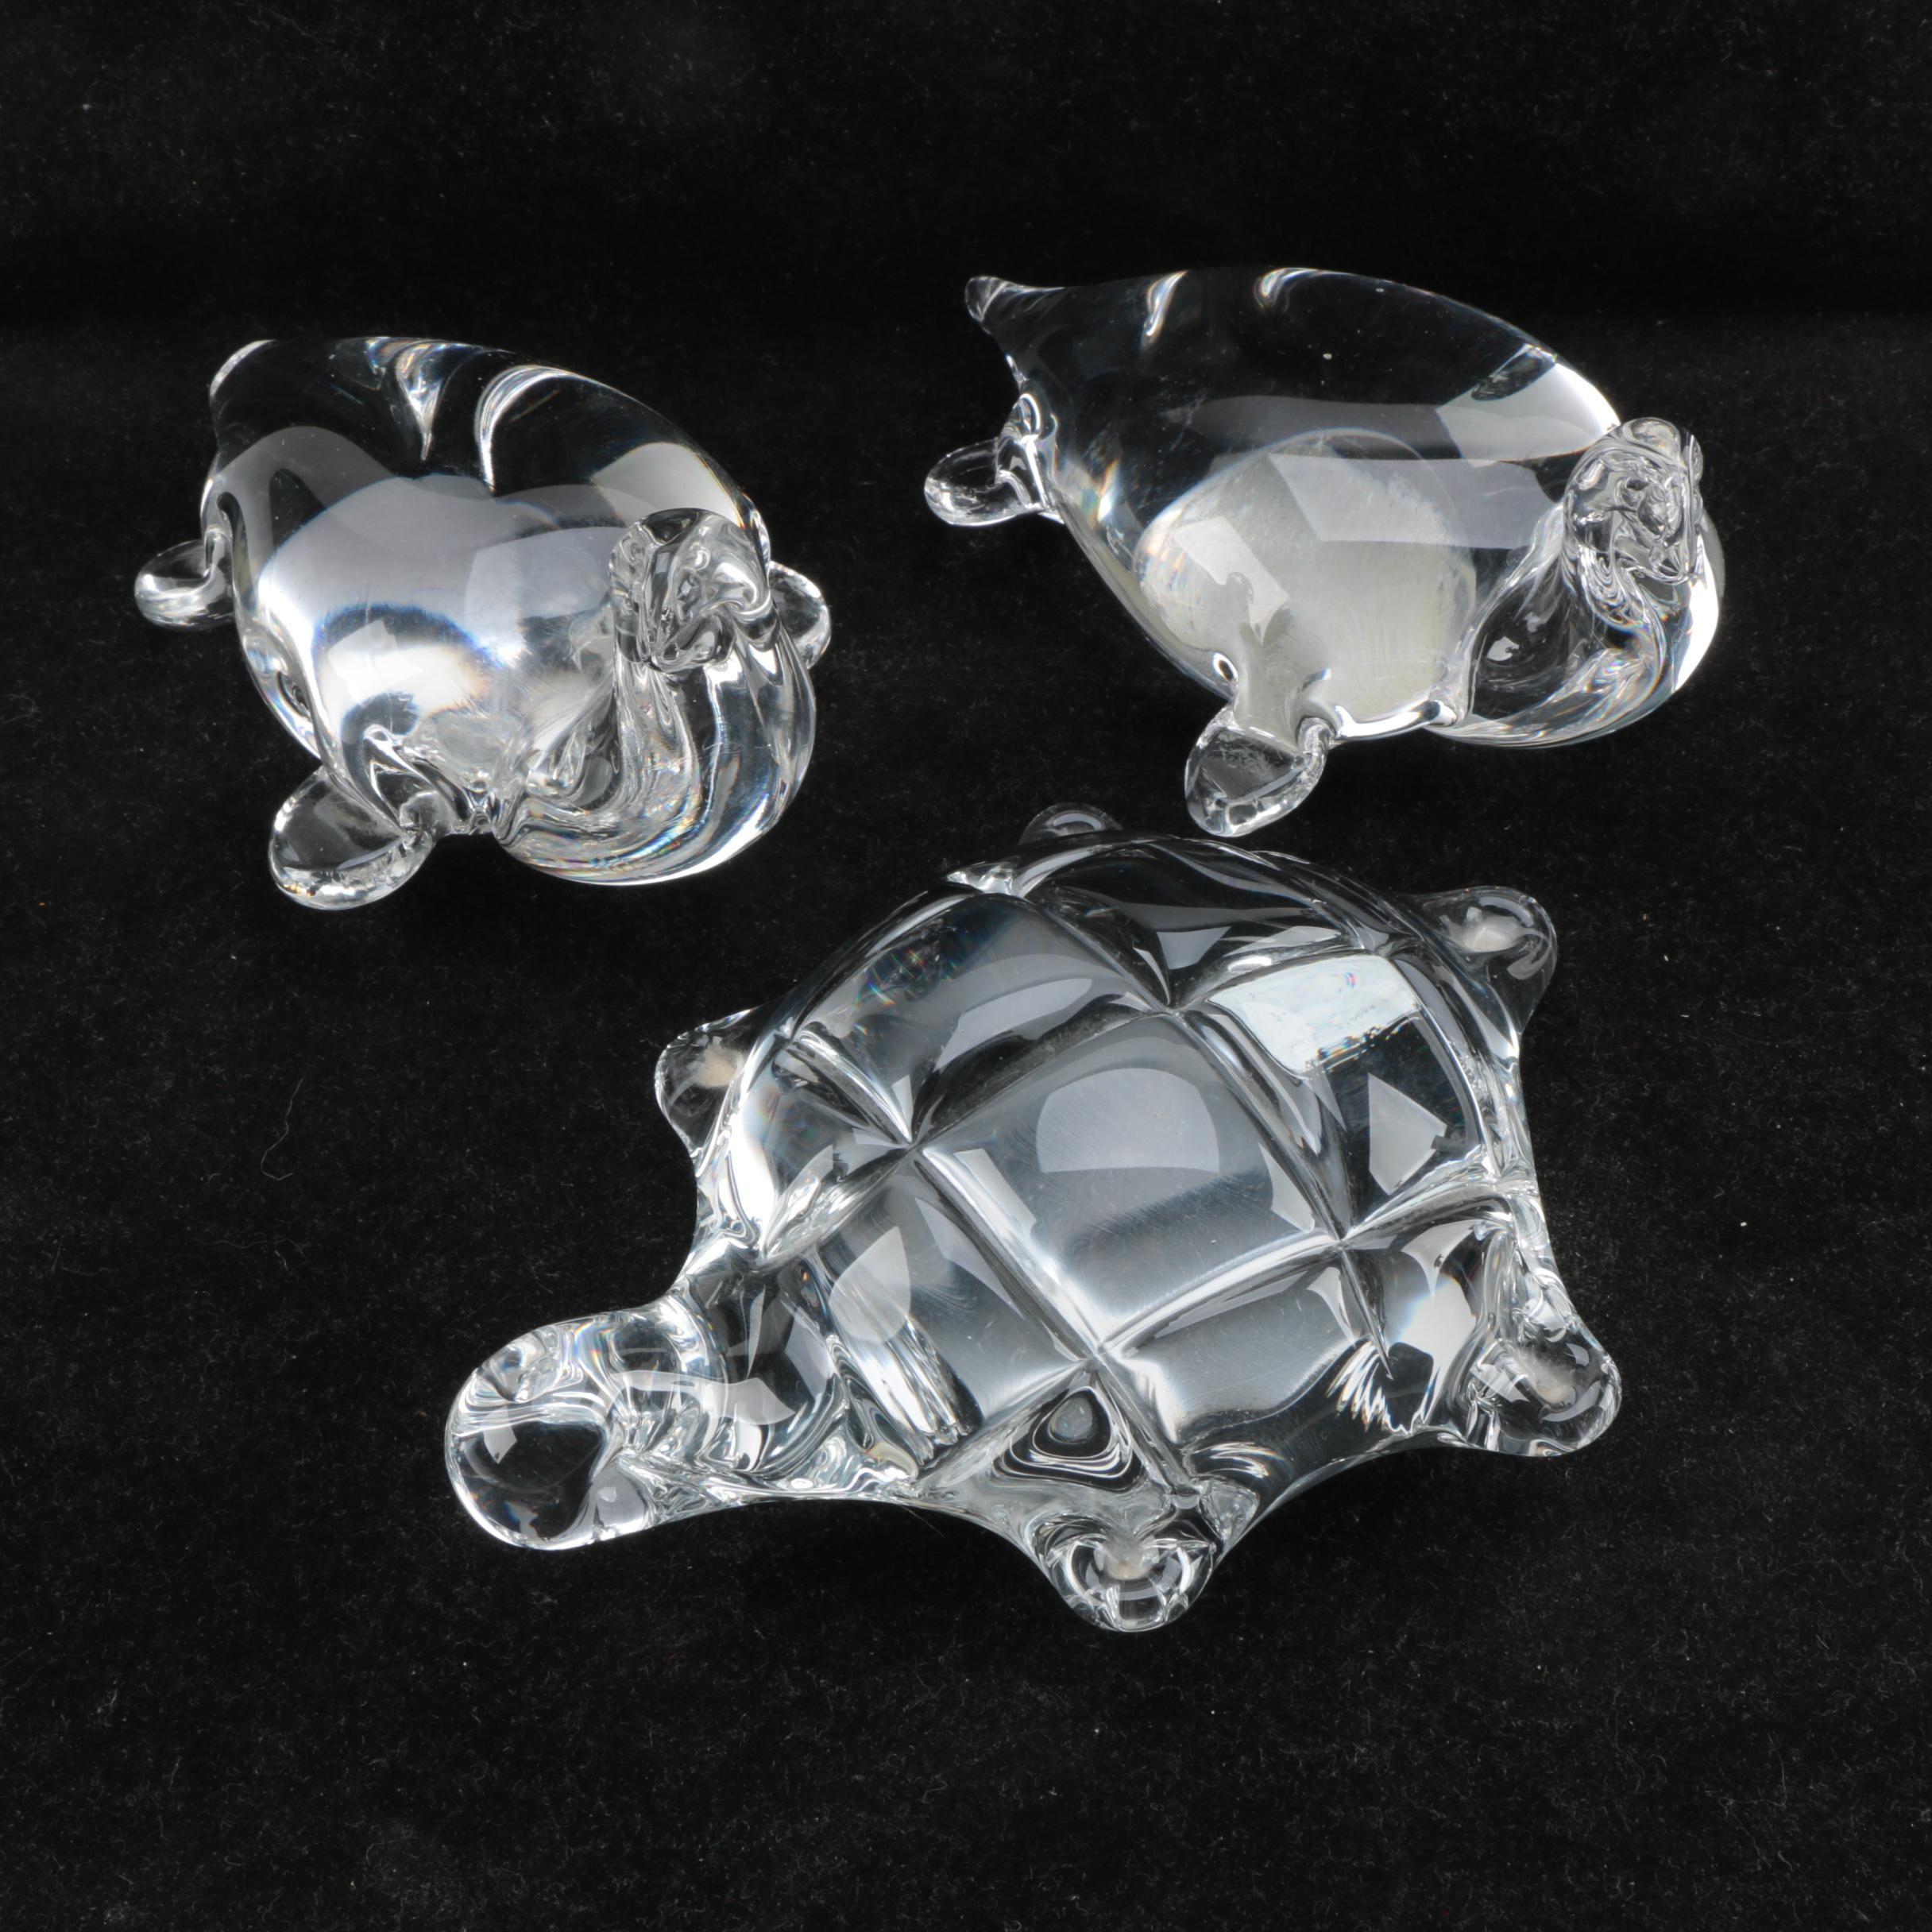 Italian Crystal Animal Figurines Including Vilca Atelier